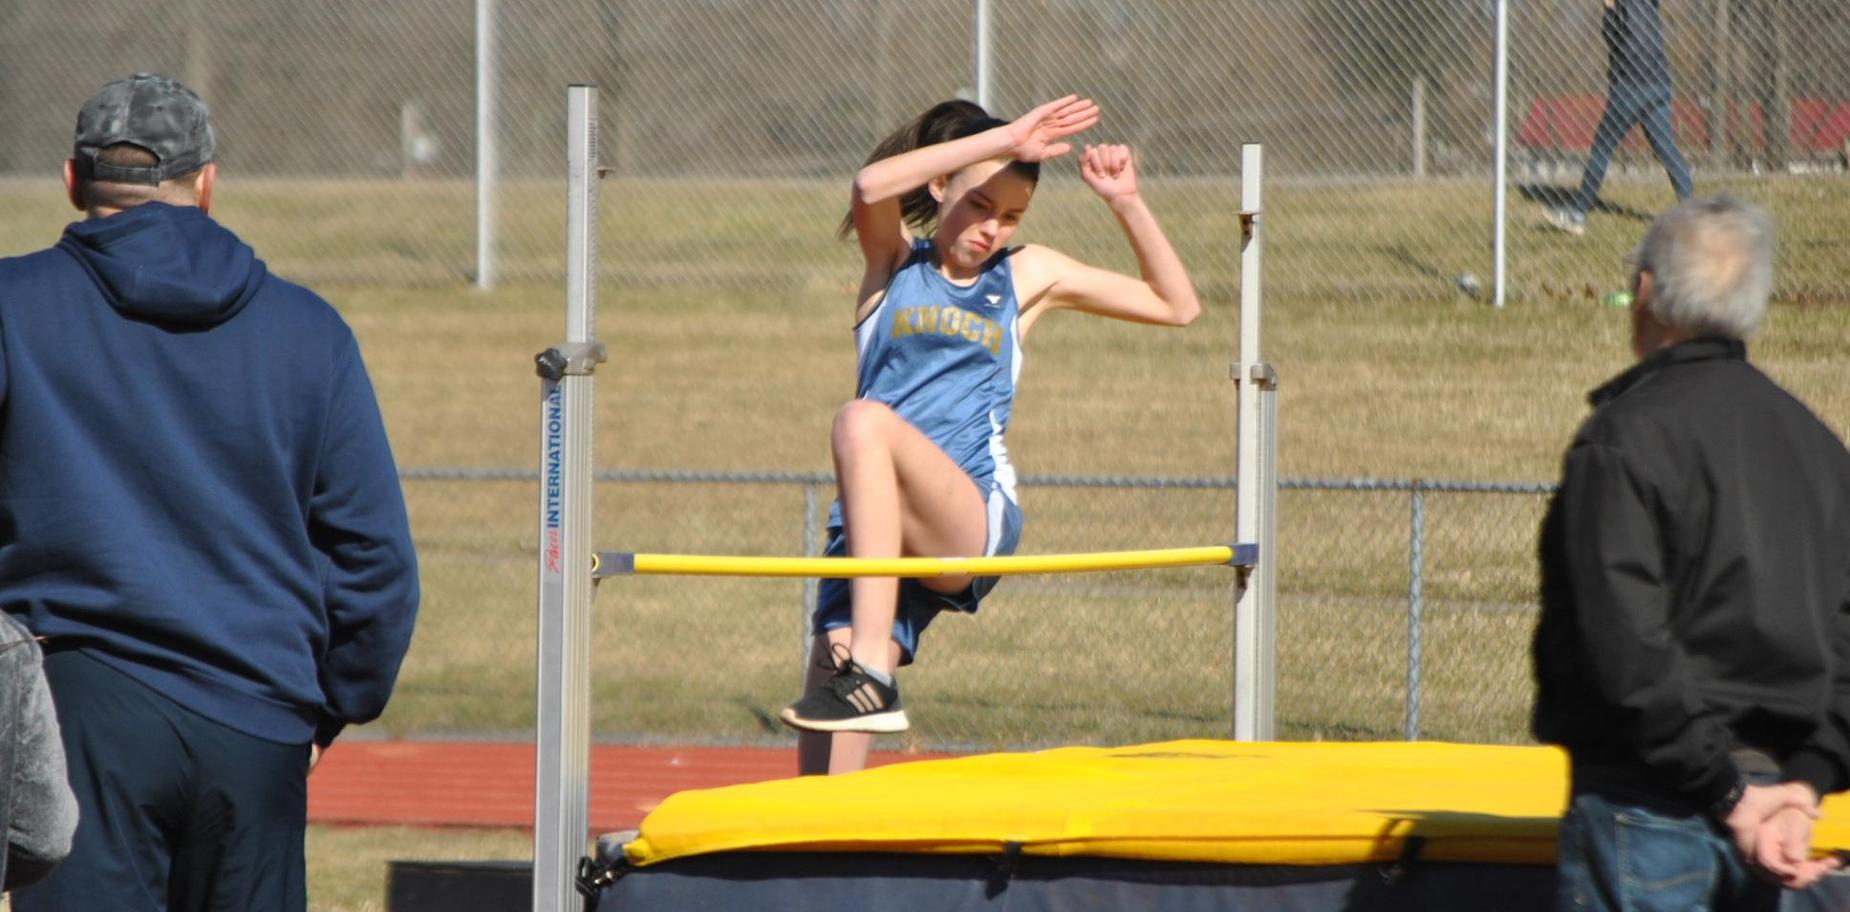 Student doing high jump